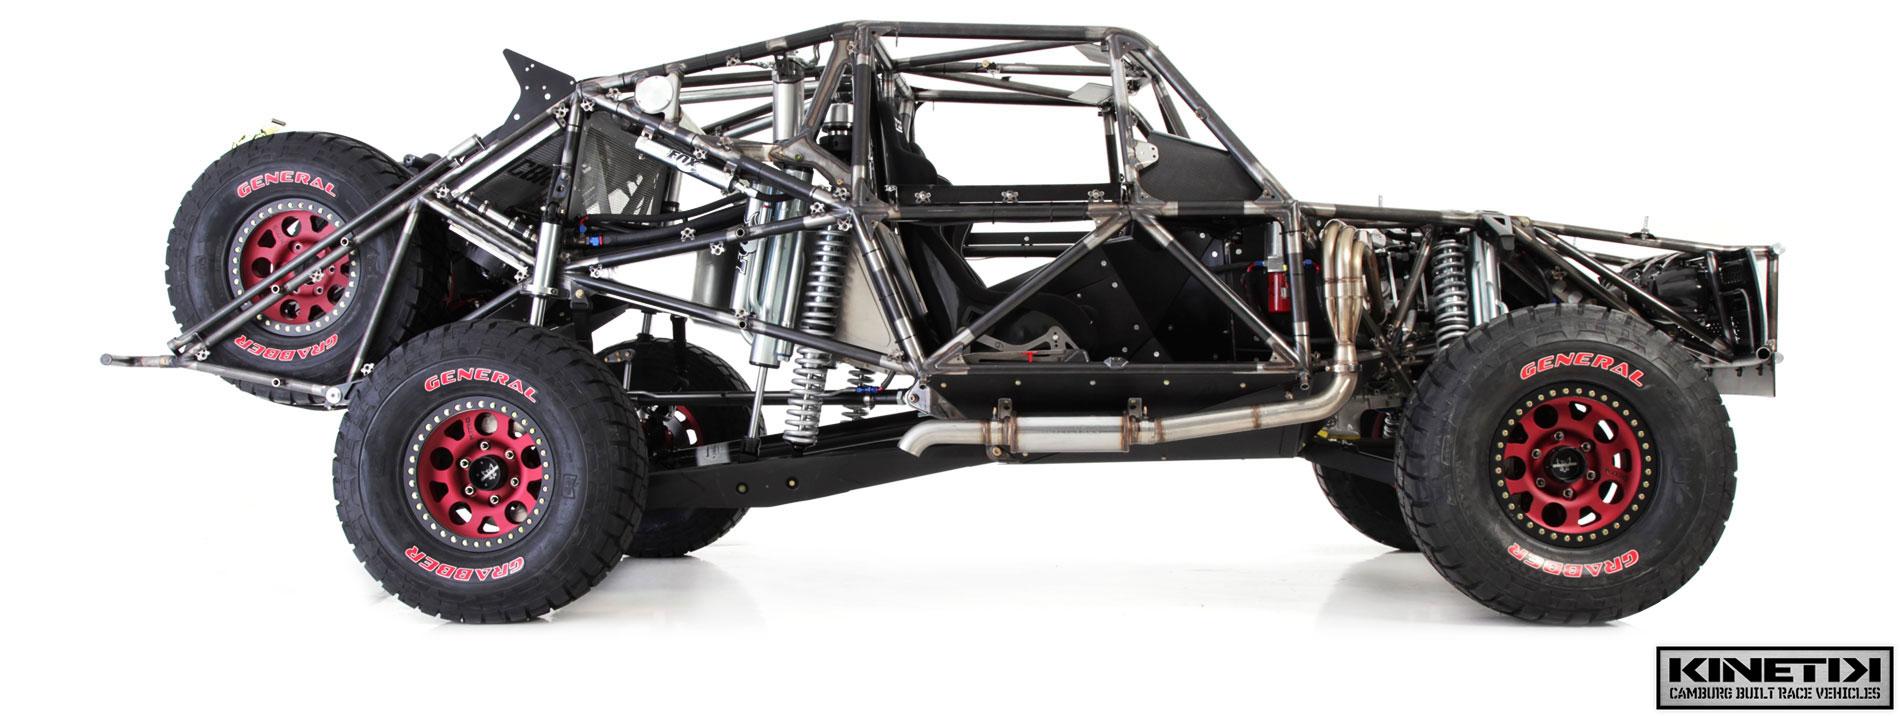 On Hold - * On Hold Indefinitely* Kinetik 6100 Trophy Truck